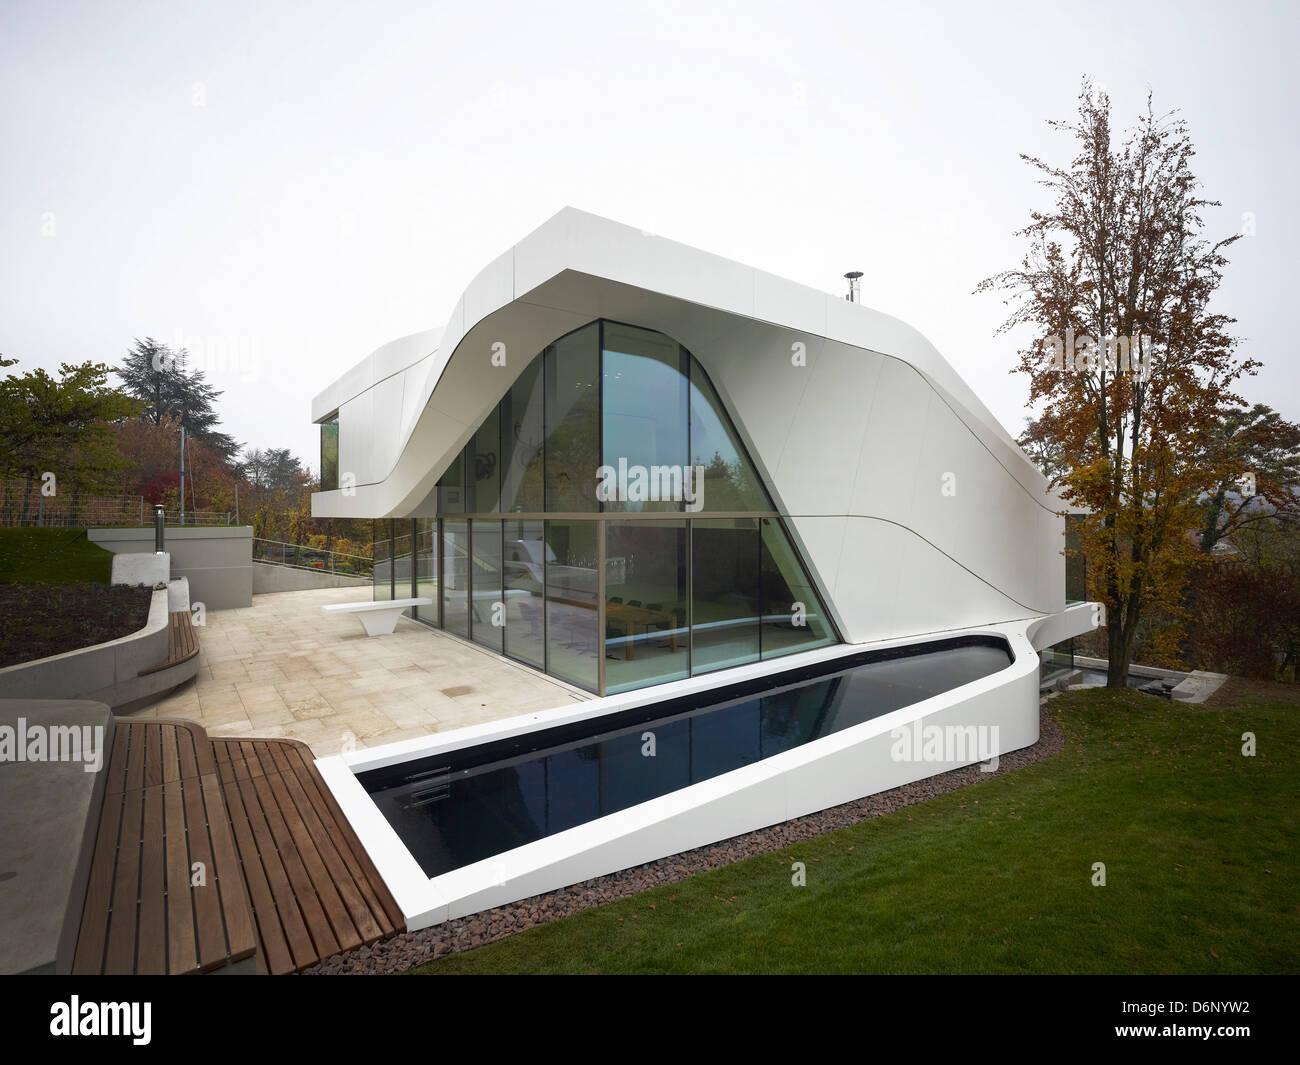 Haus am Weinberg, Stuttgart, Germany. Architect: UN Studio, 2011. Stock Photo